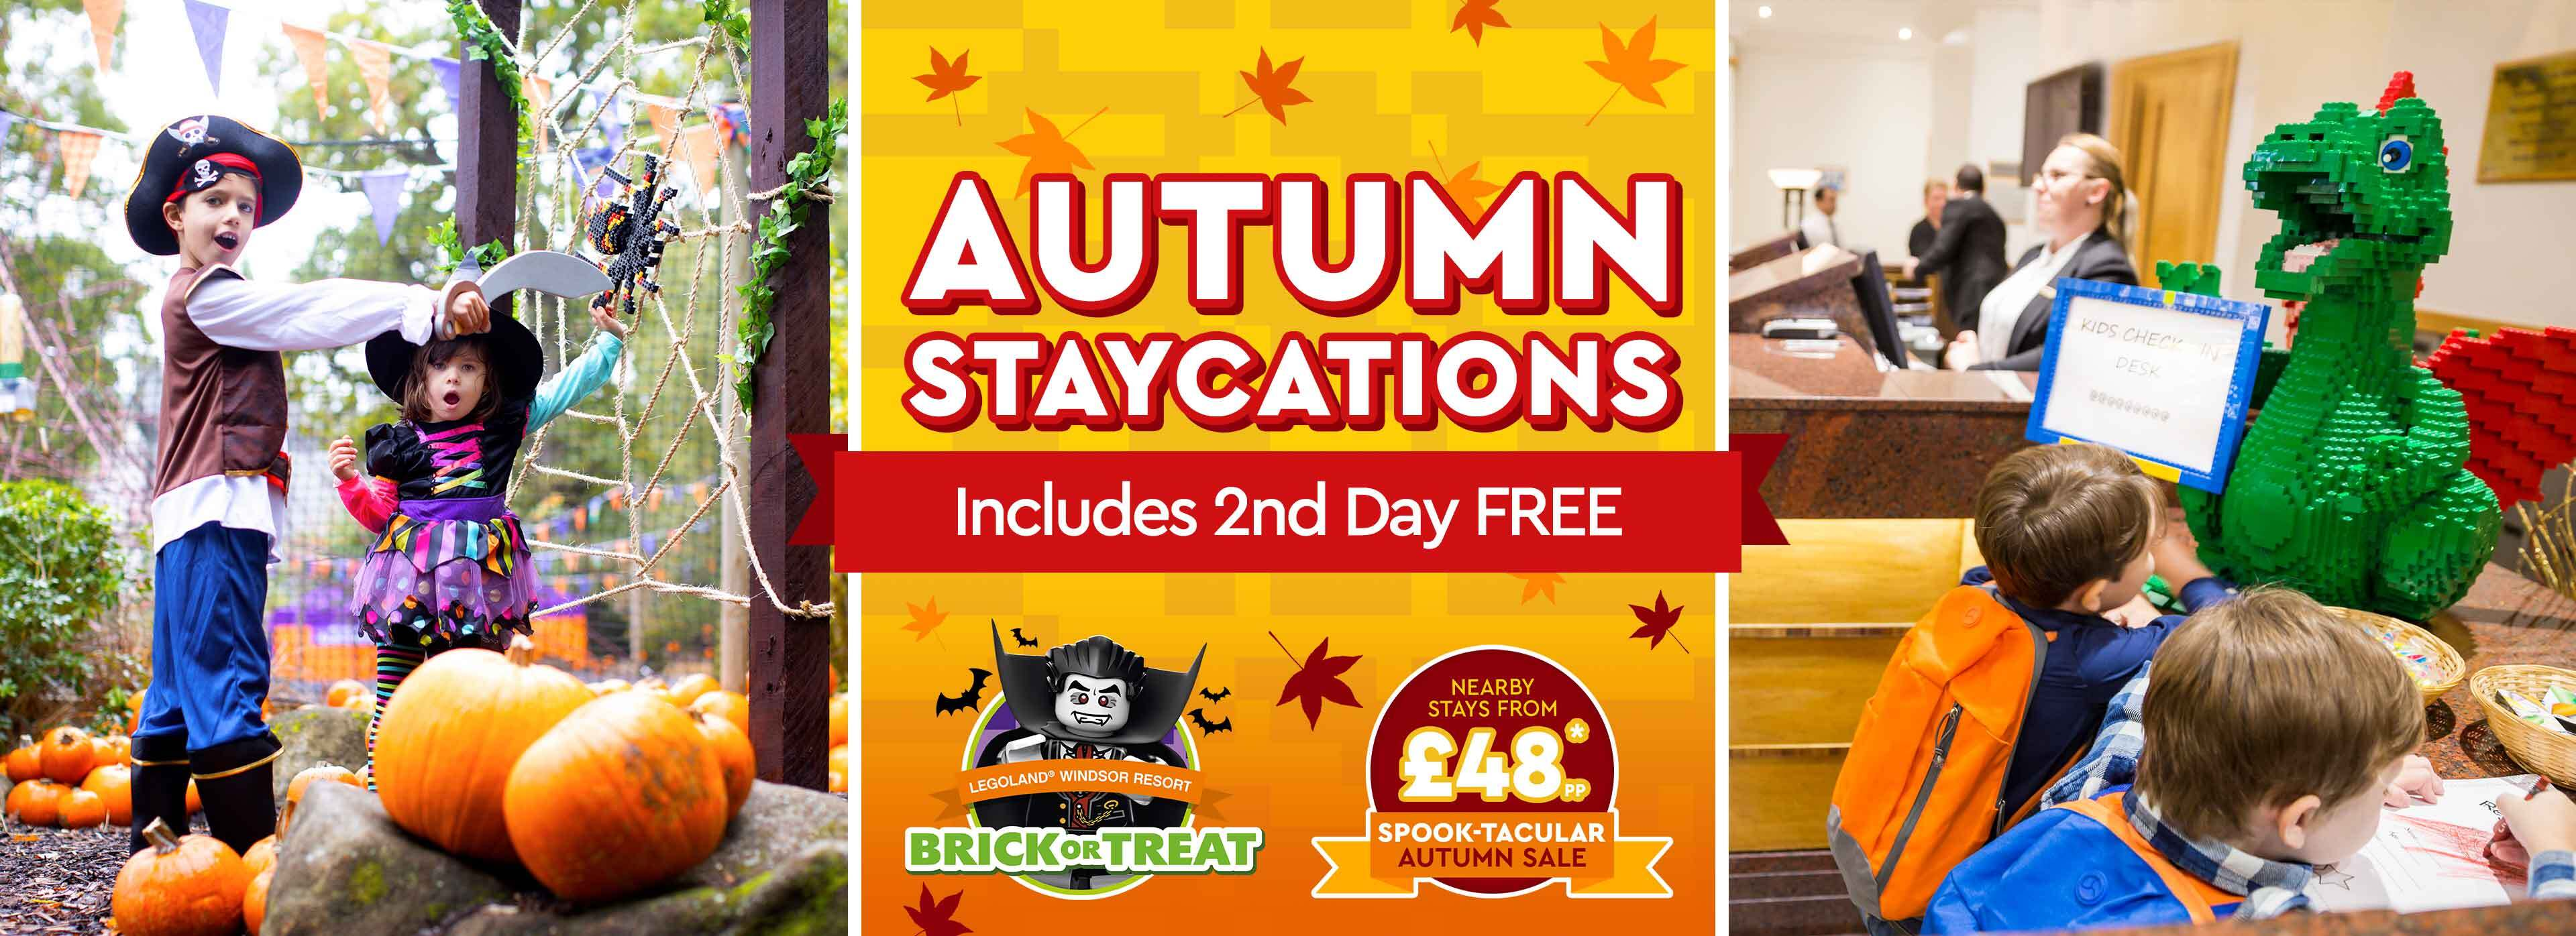 Spook-tacular Autumn Sale with LEGOLAND Holidays